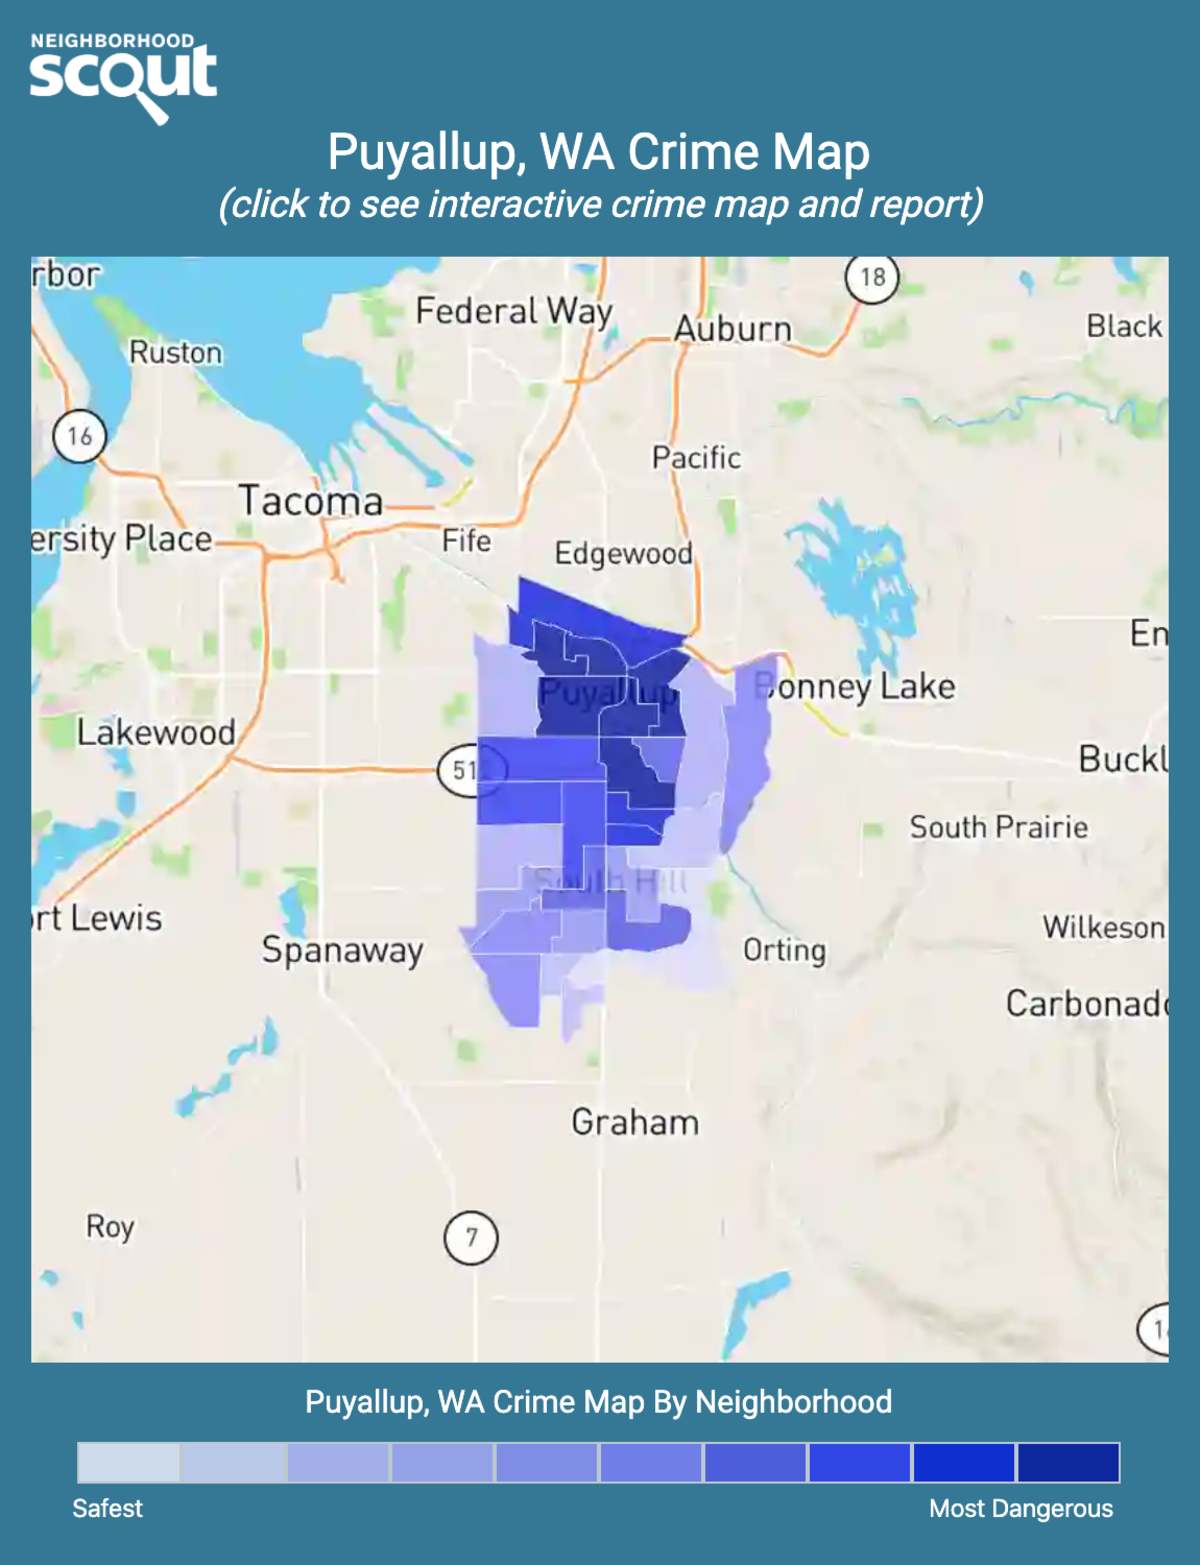 Puyallup, Washington crime map